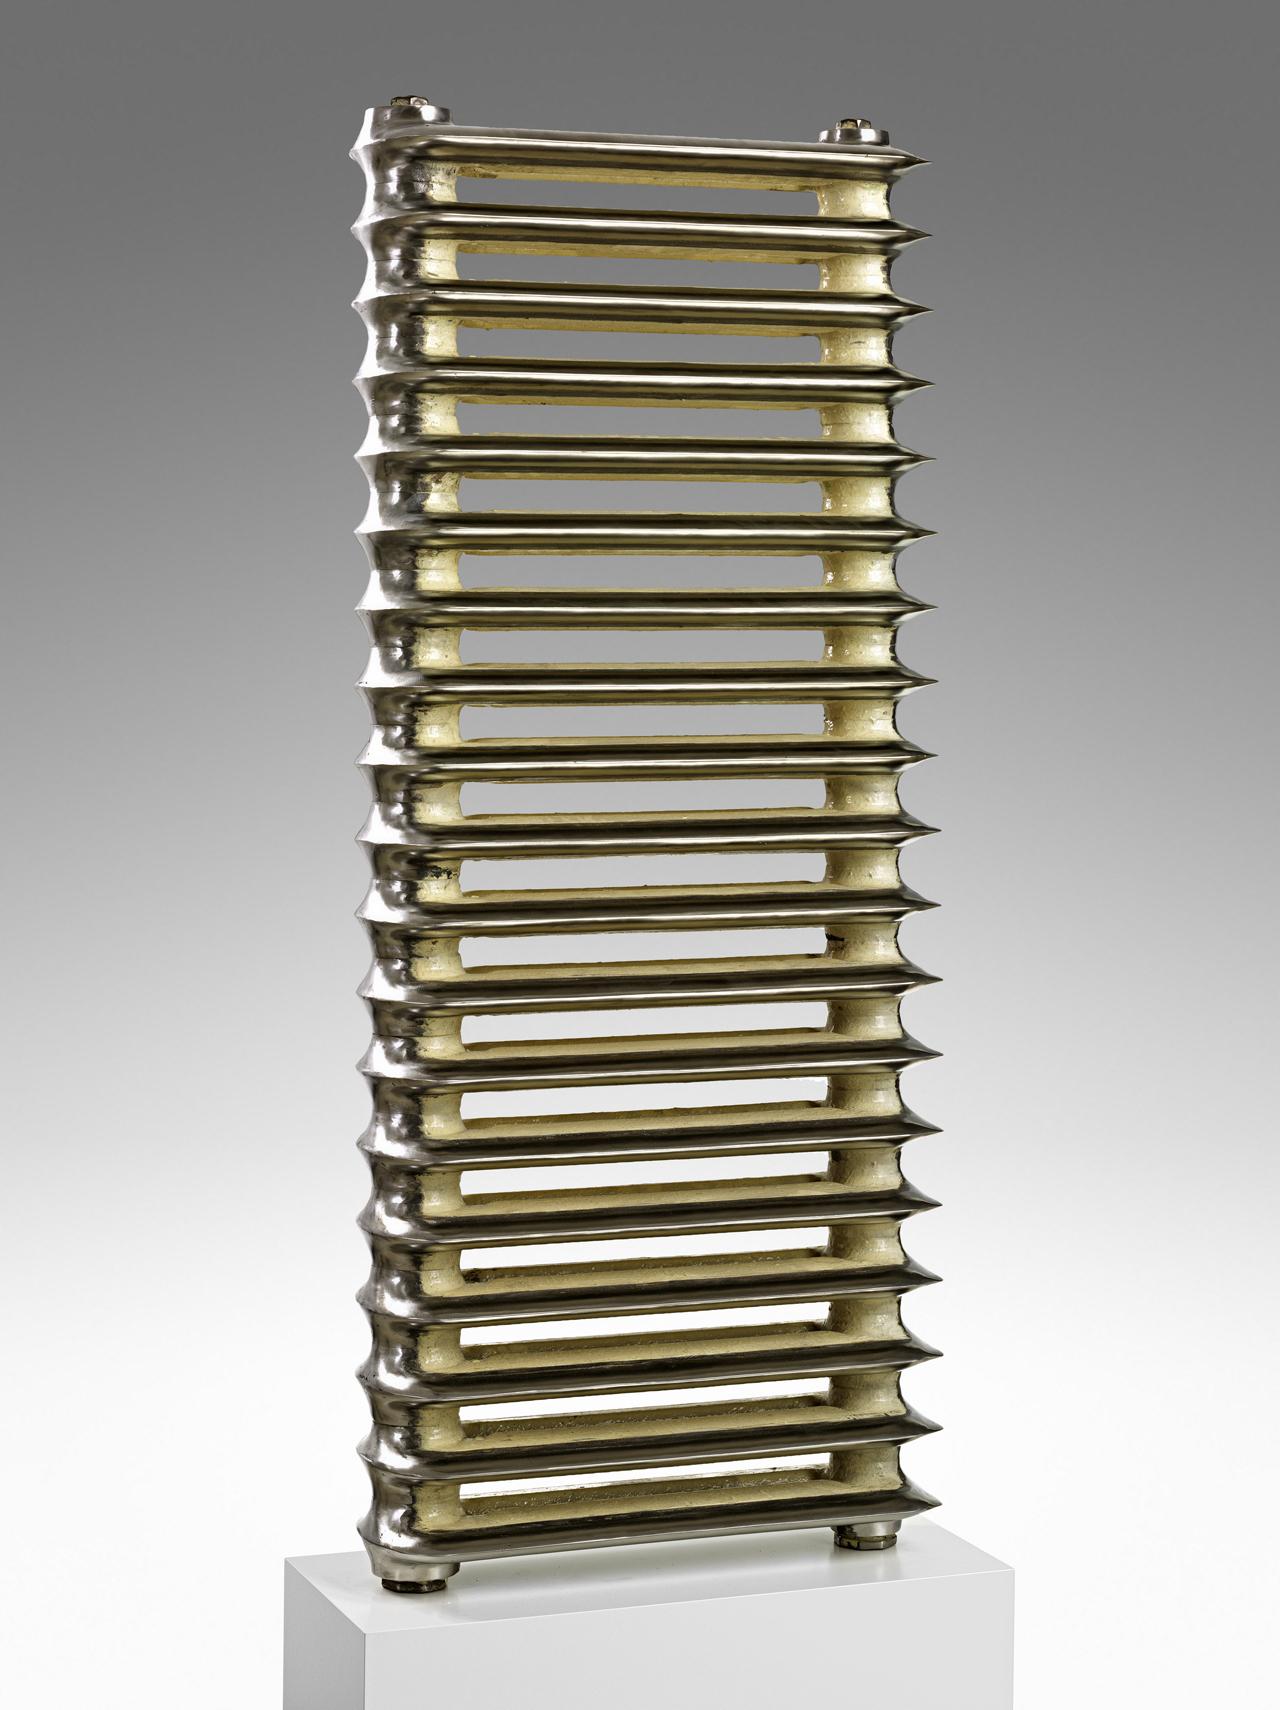 Max Frisinger, Spare Rips, 2012, Gusseisen, poliert, 146 x 60 x 20 cm